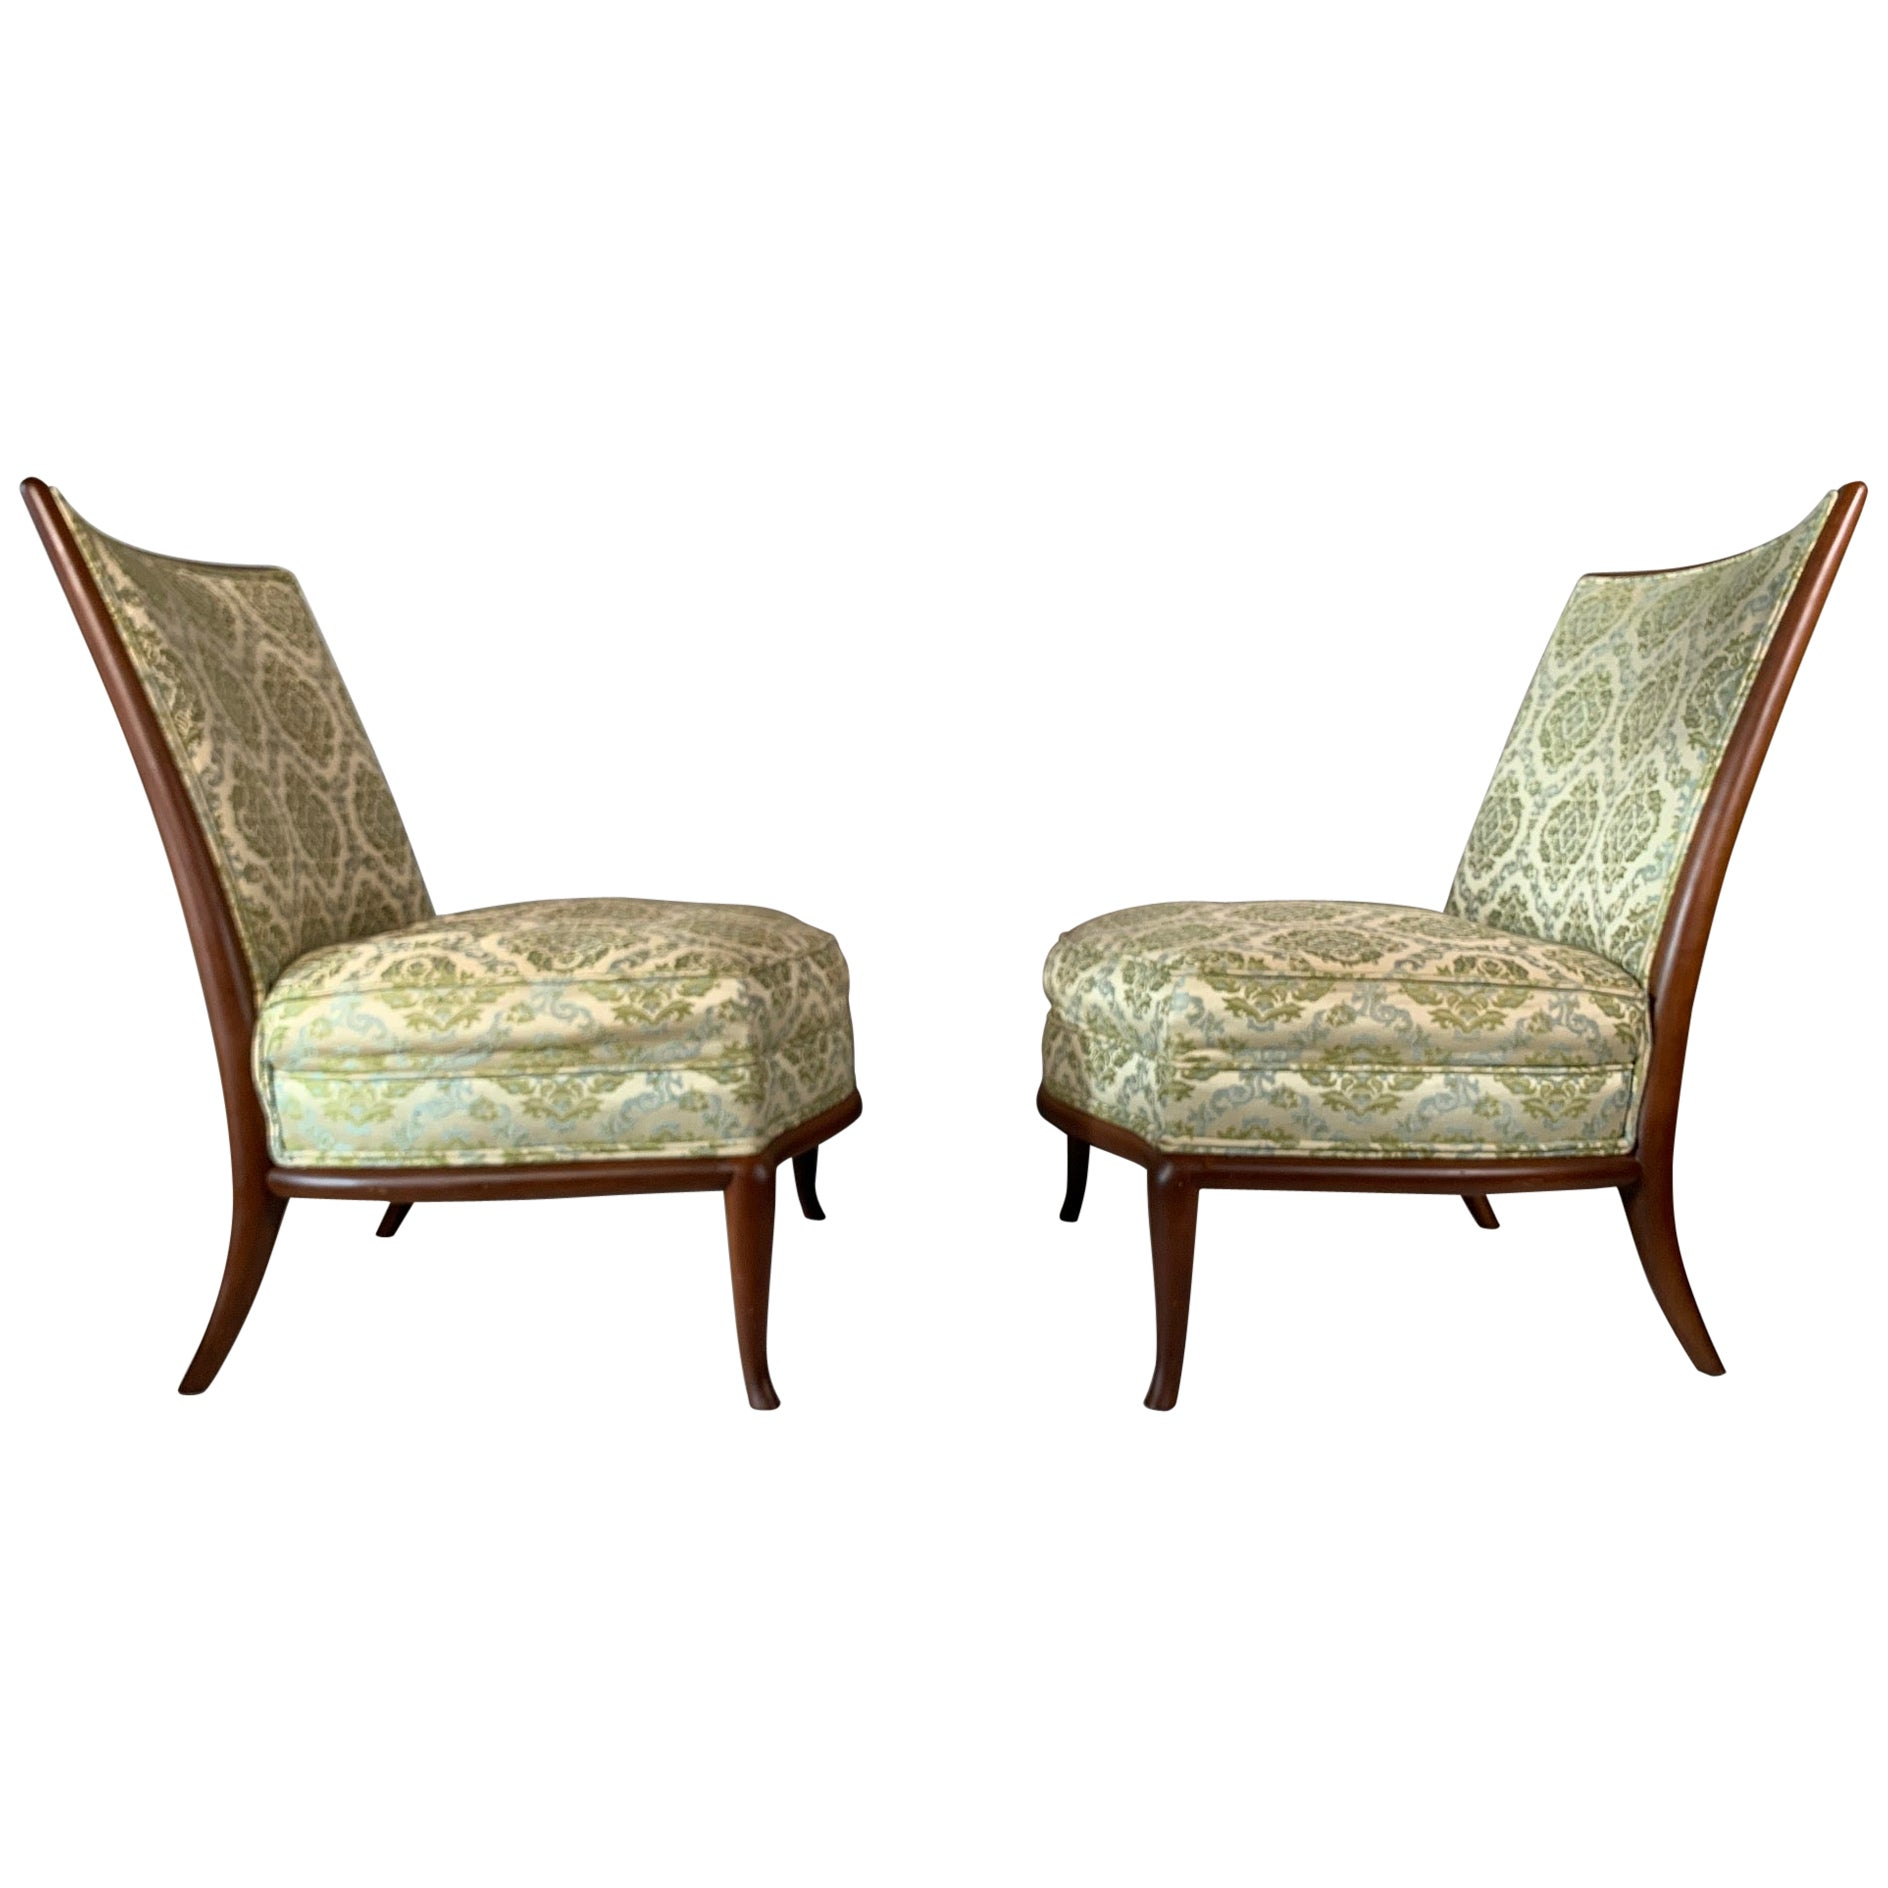 Pair of Unusual Slipper Chairs by T.H. Robsjohn-Gibbings Widdicomb, circa 1950s